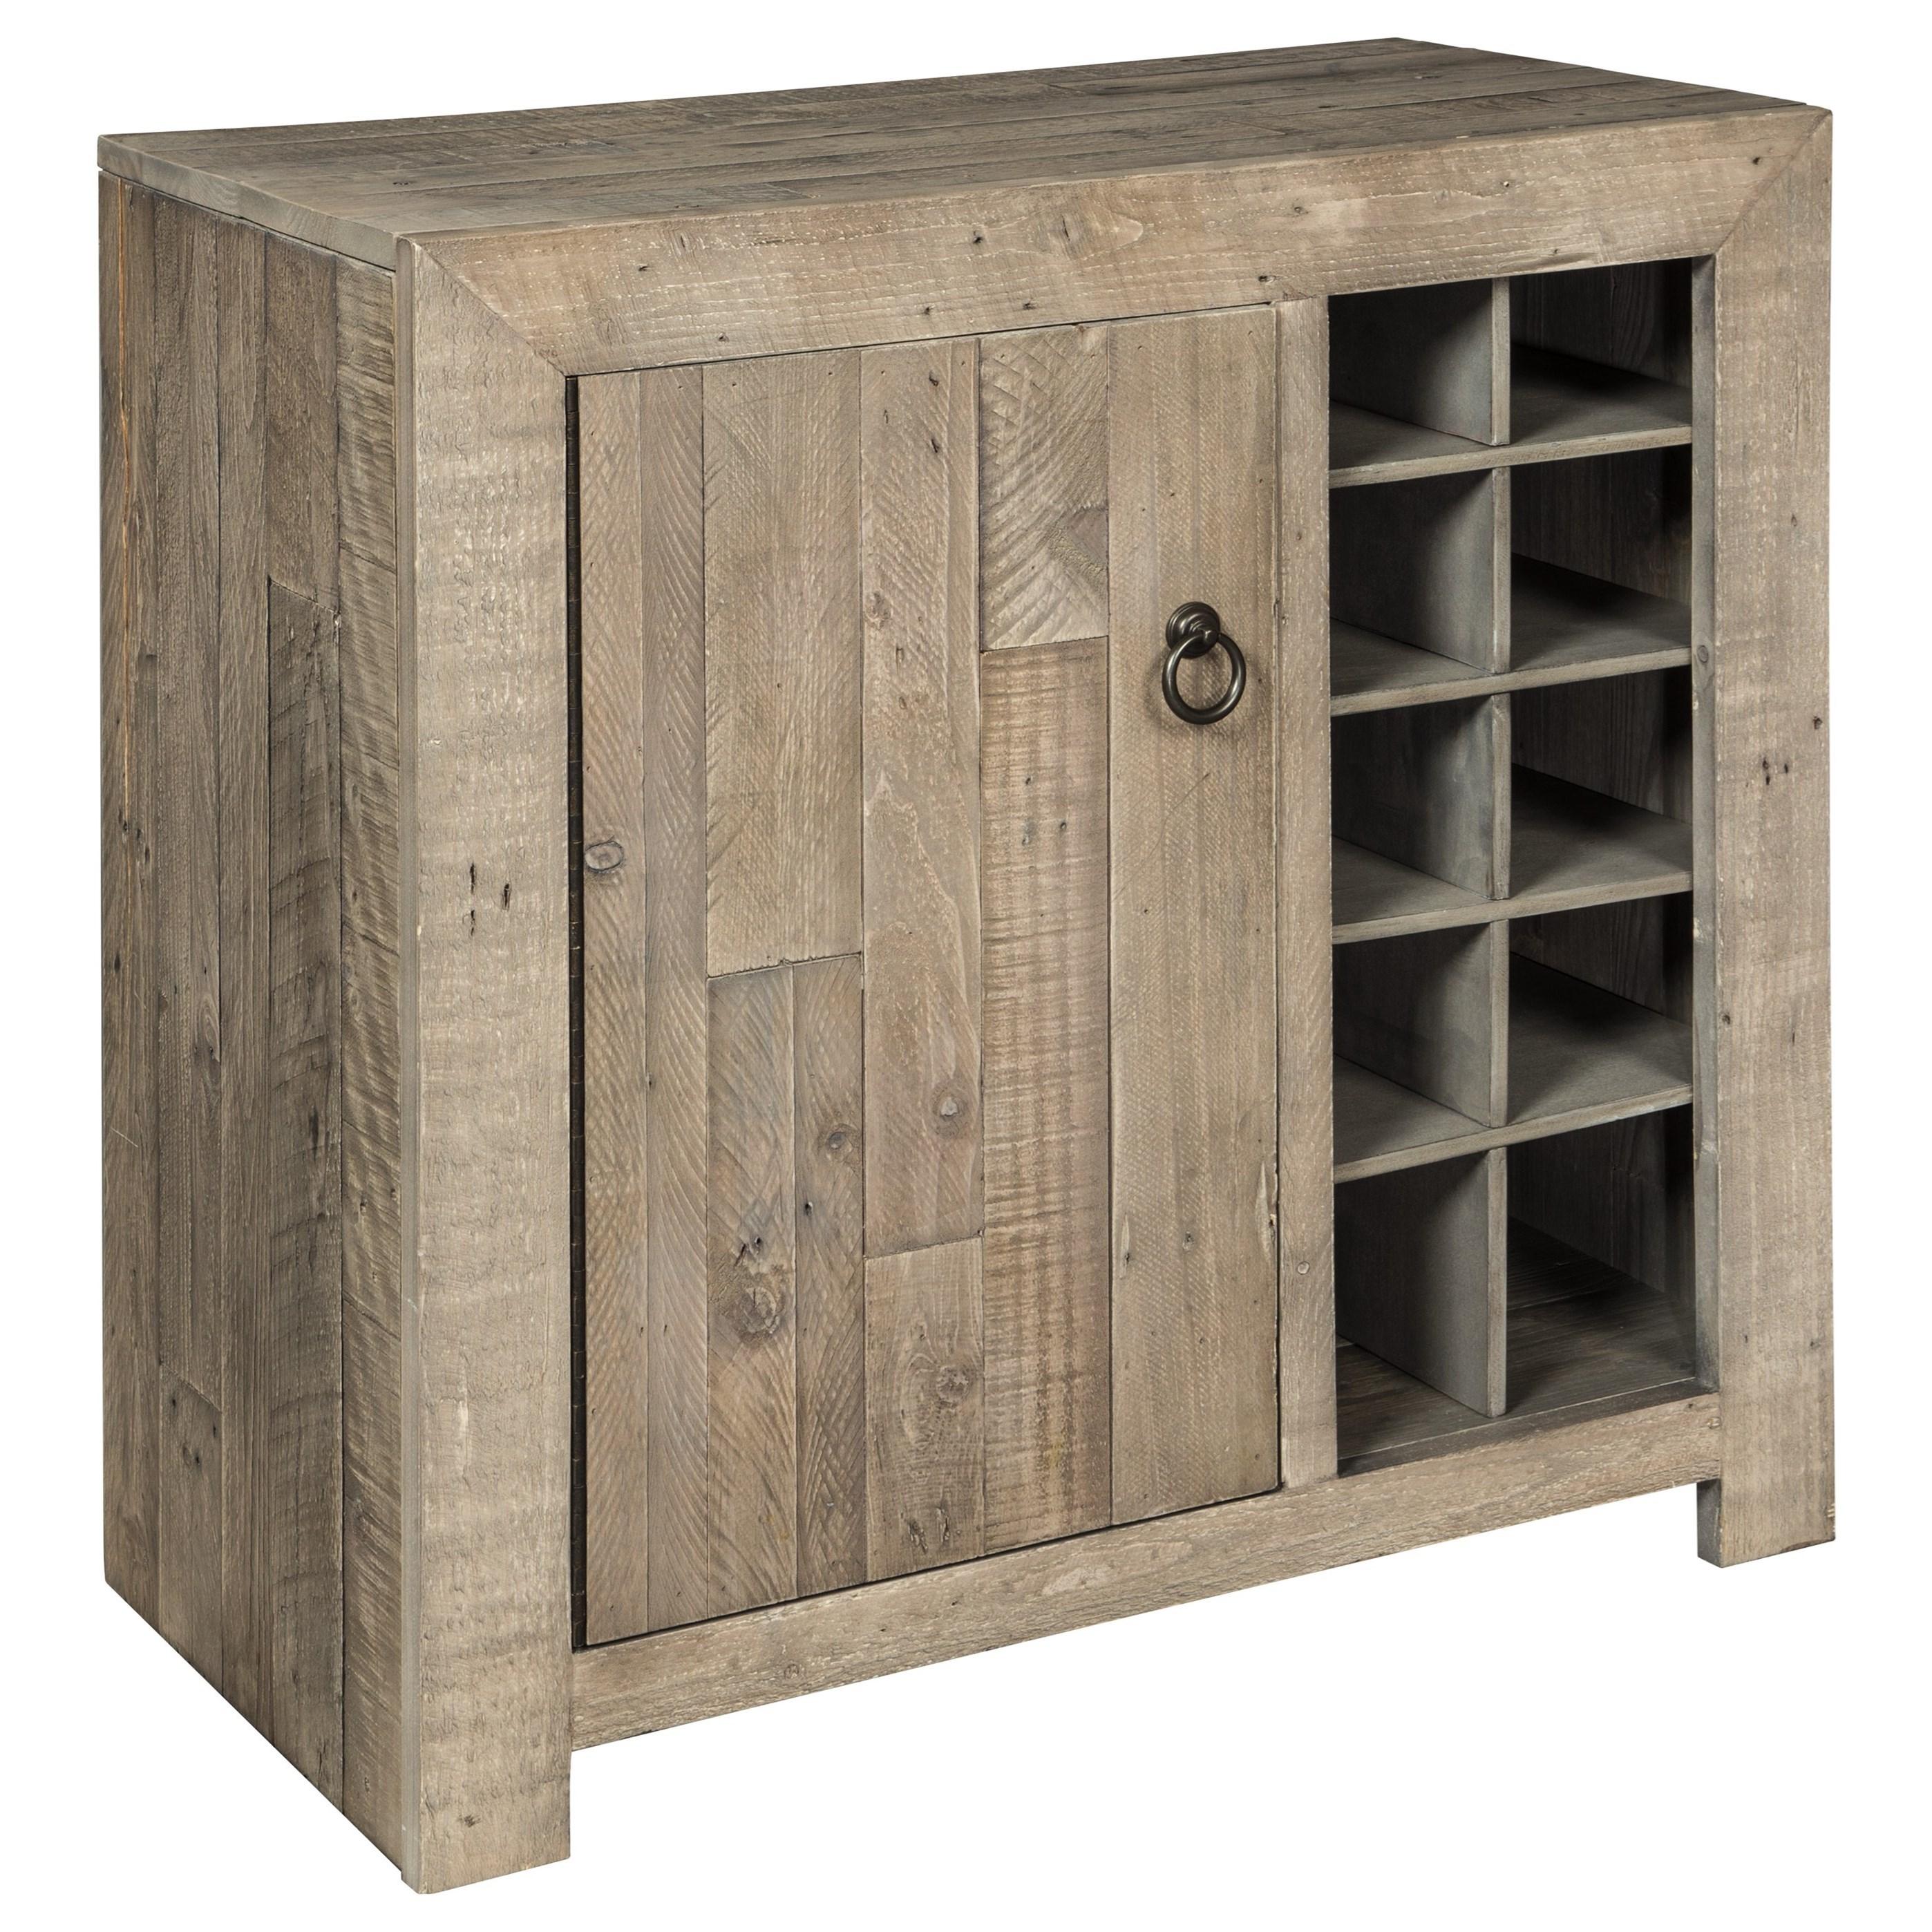 wine oak small product furniture unit cabinet display wood rack shrewsbury solid telford msl cupboard rustic dresser chunky